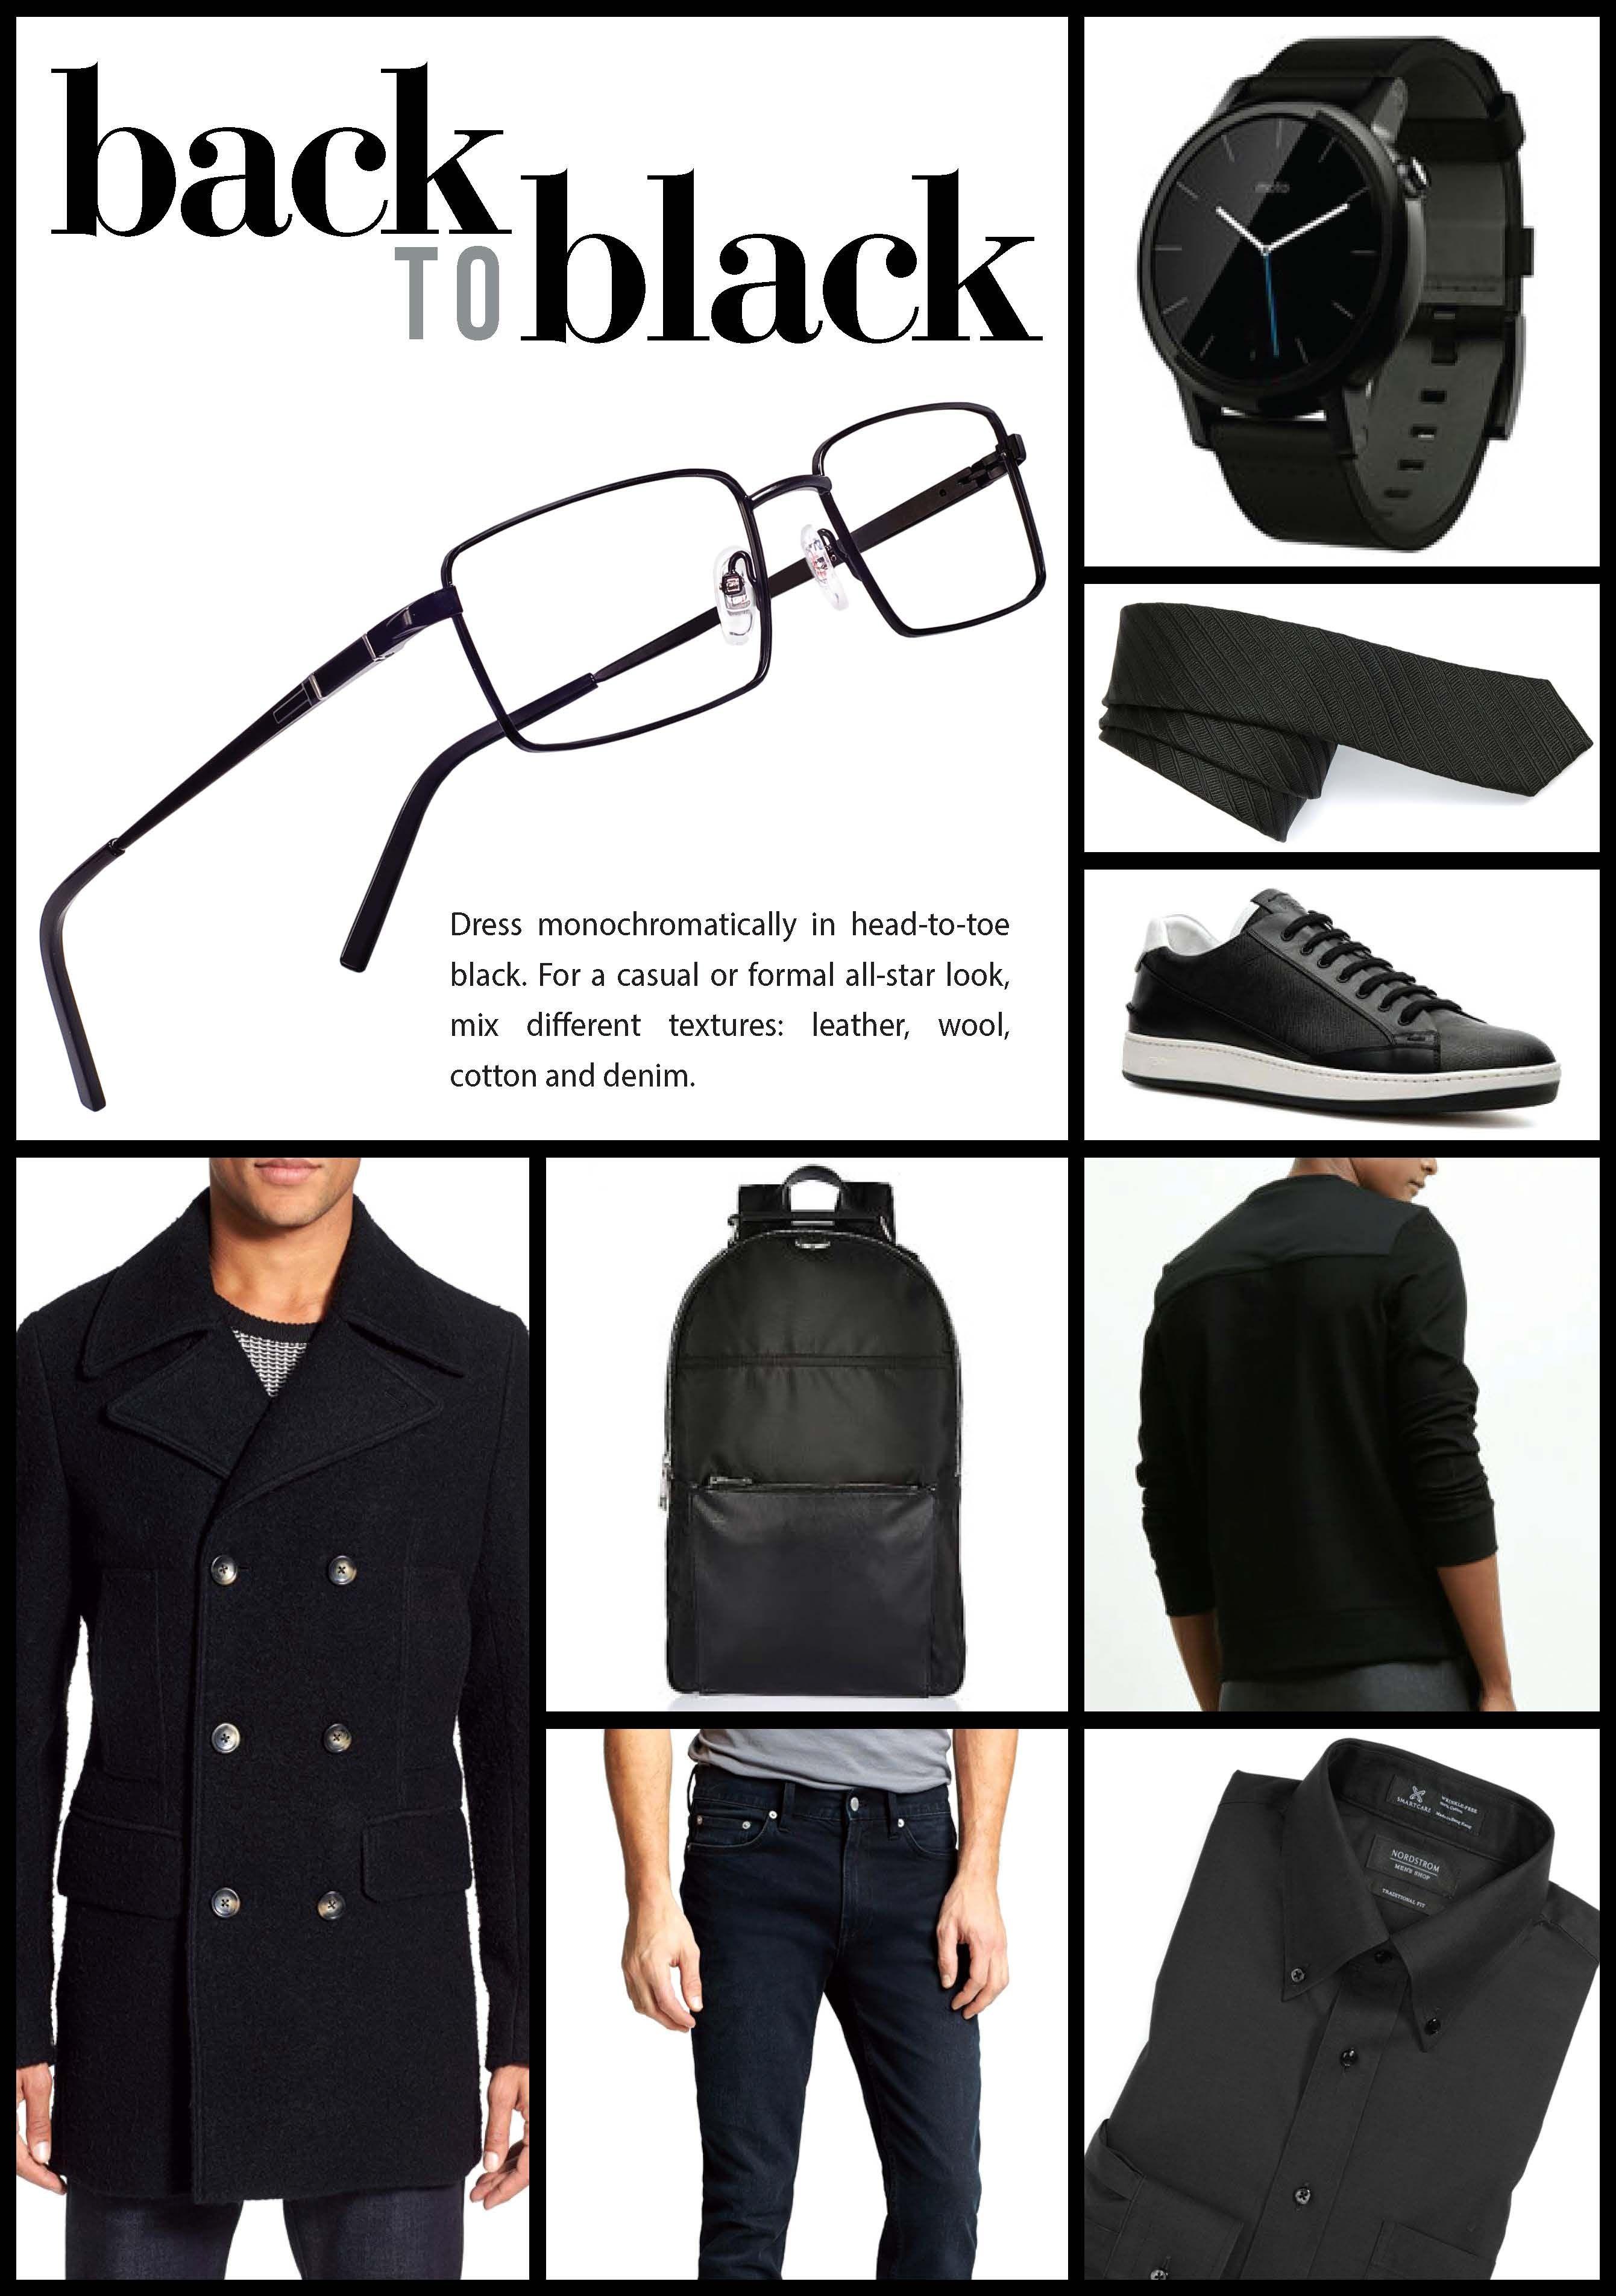 454722a21fe Back to Black. Dress monochromatically in head-to-toe black. Featuring XXL  Eyewear Bomber  eyewear  fashion